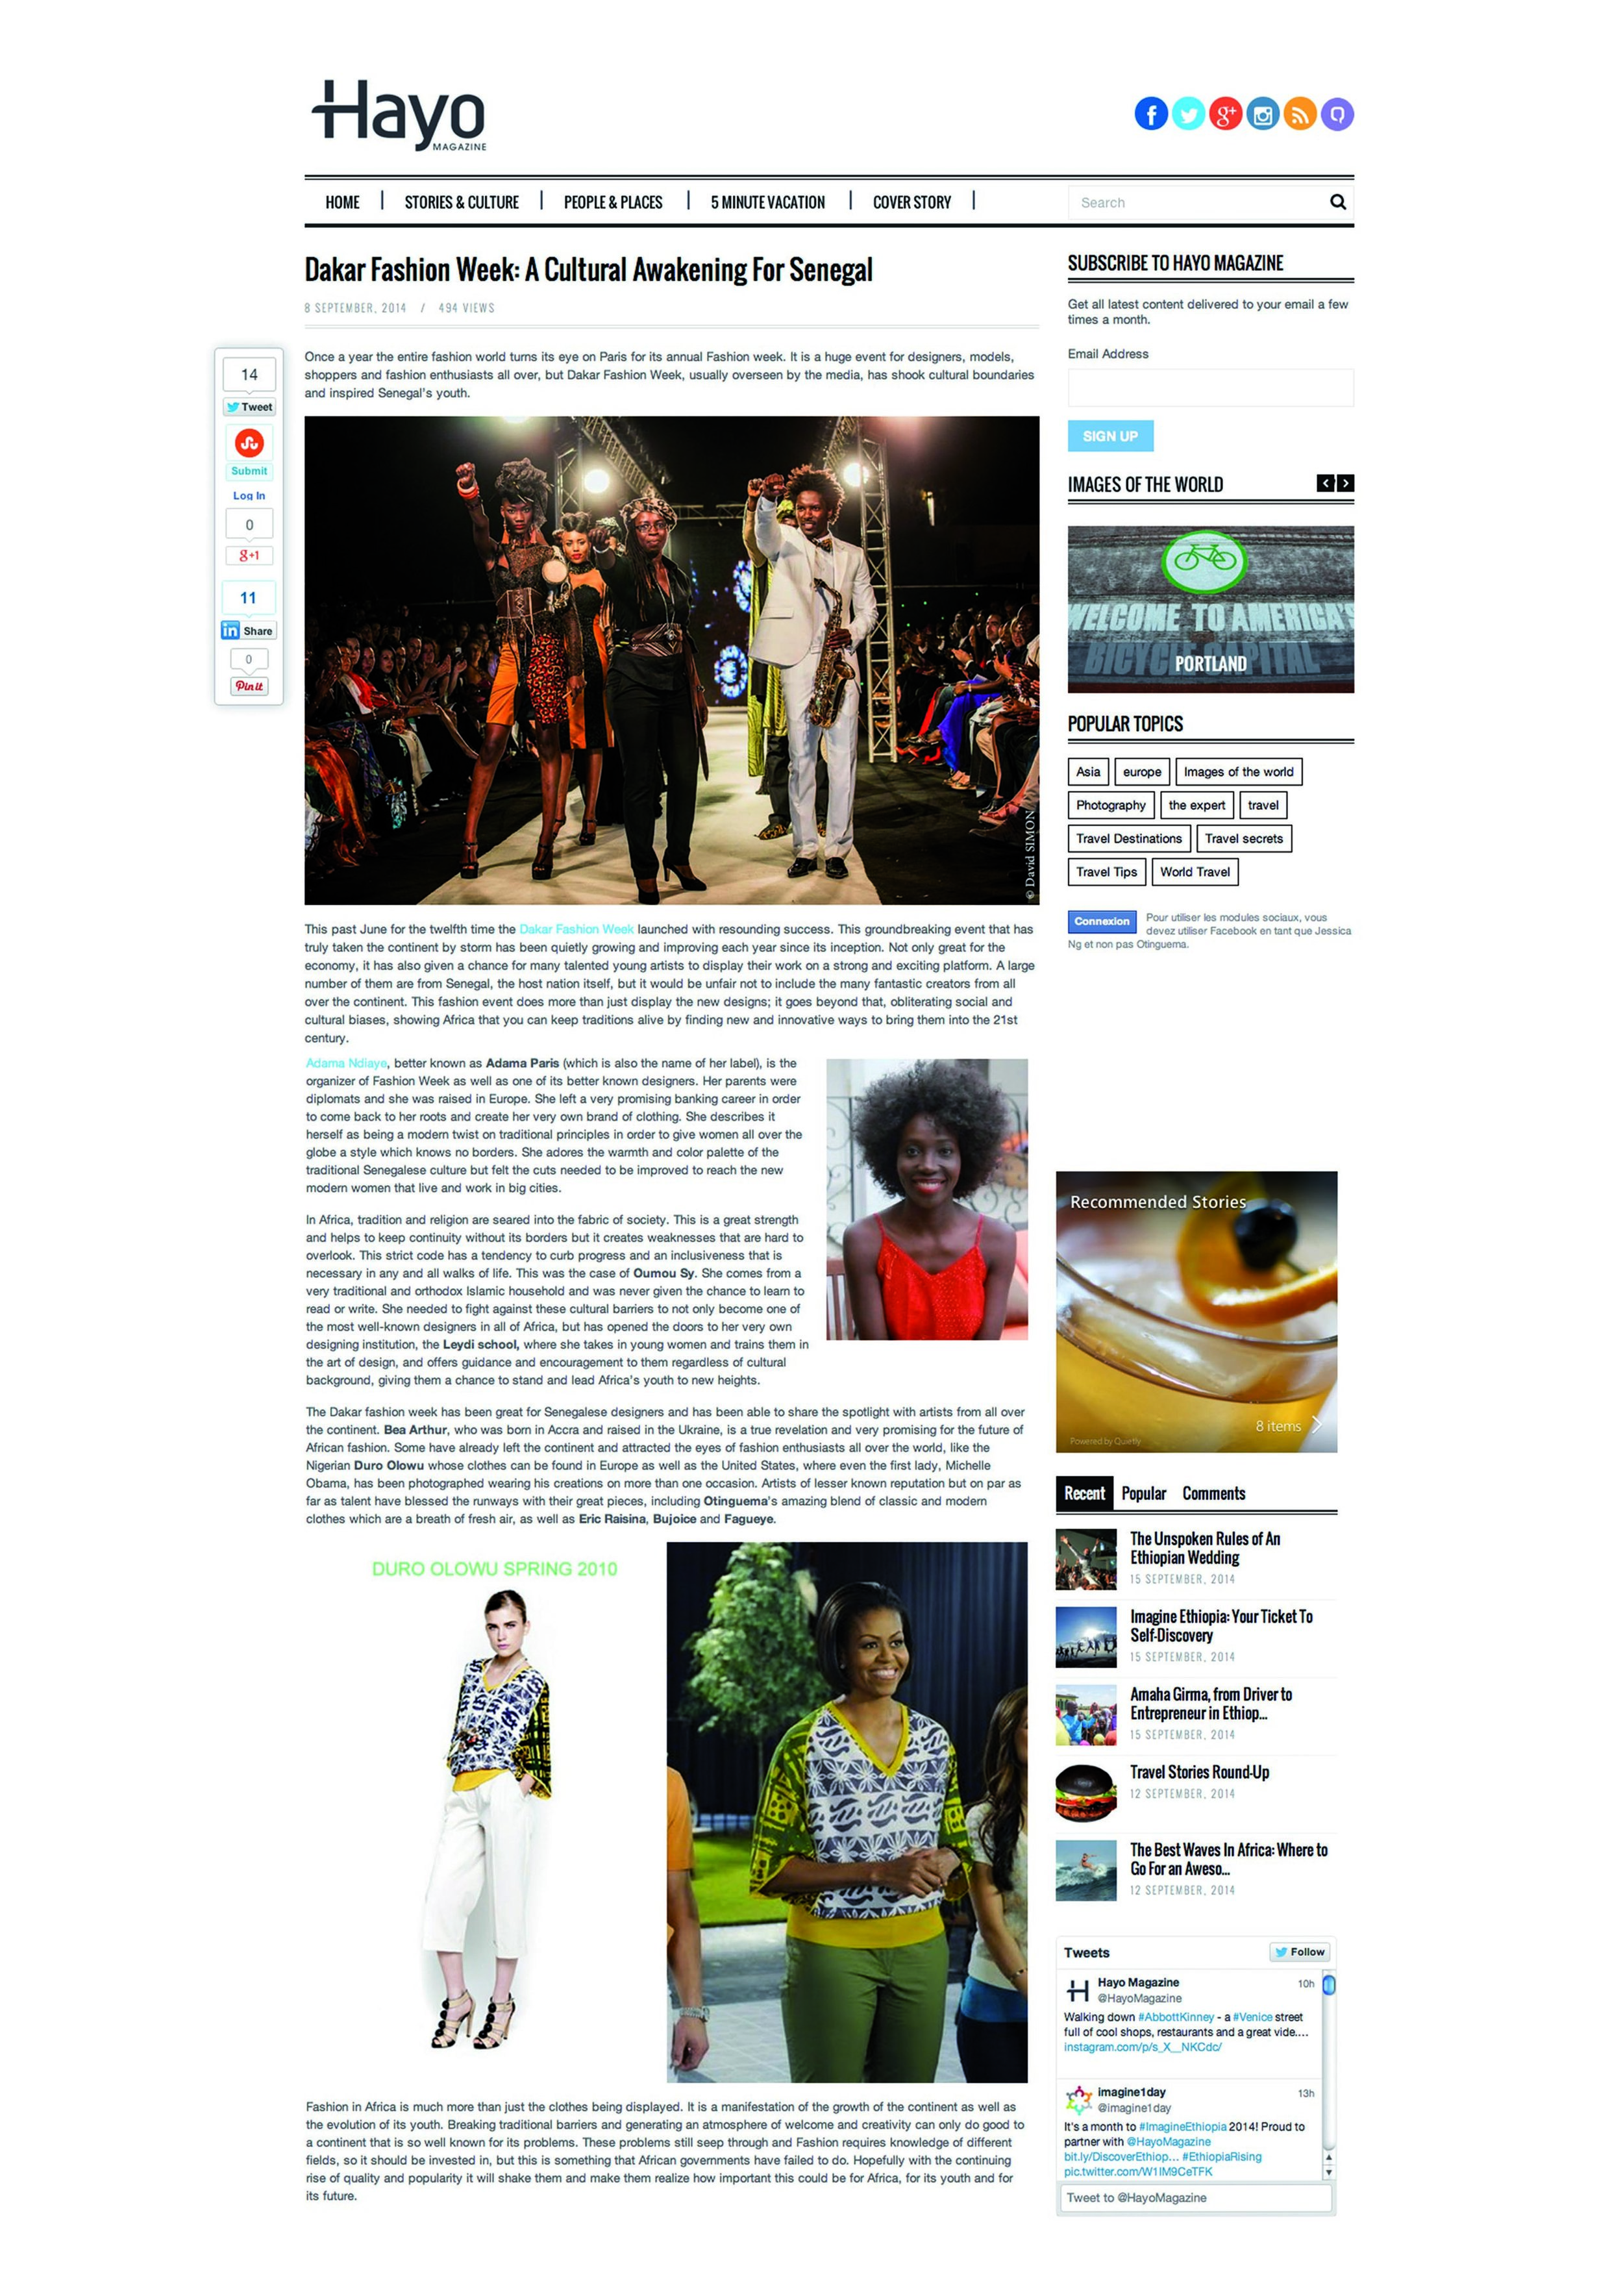 Copy of Hayo Webzine